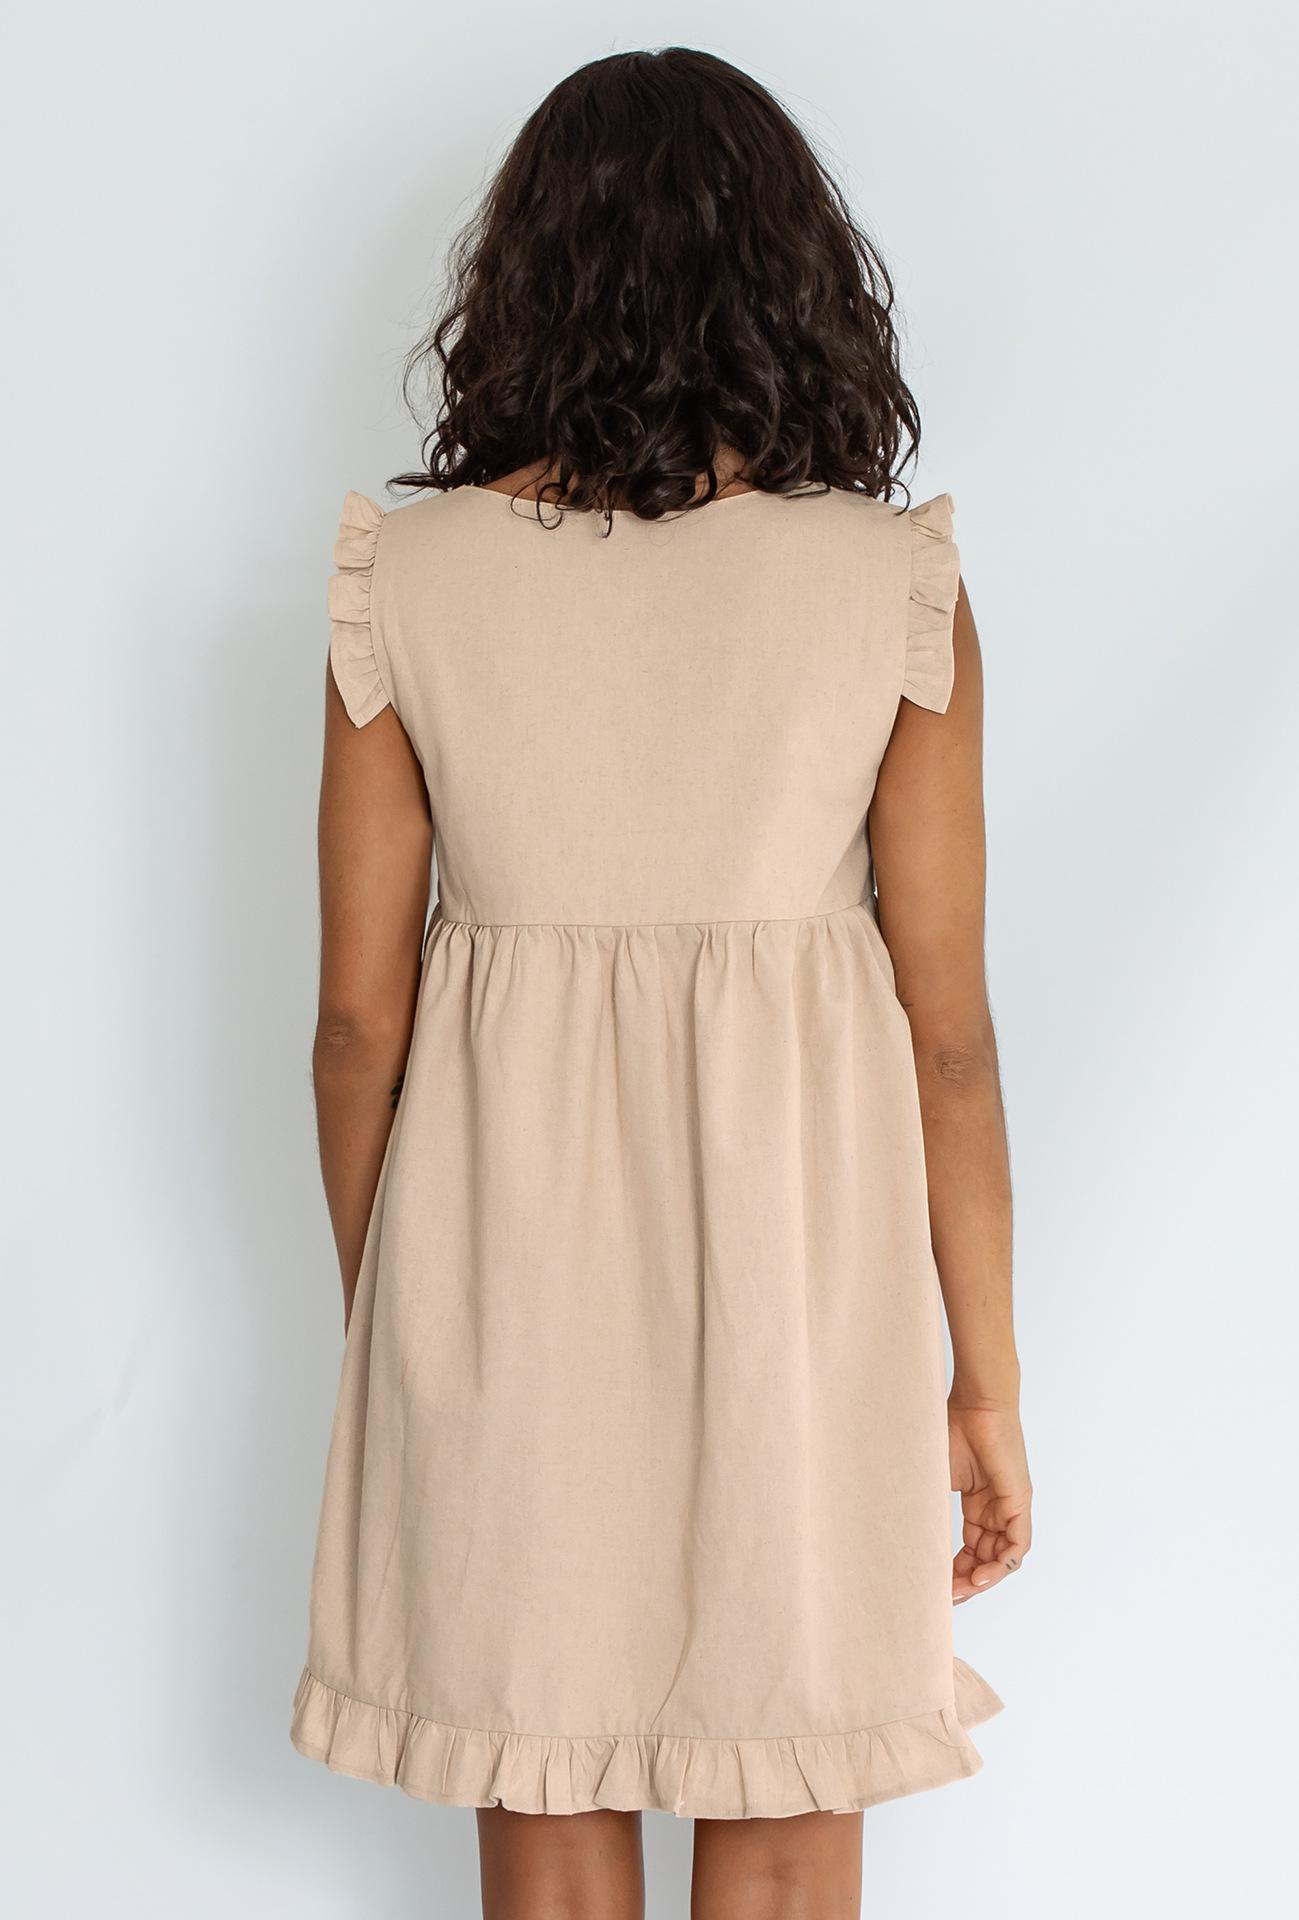 new ruffled square collar loose dress NSYSB47840